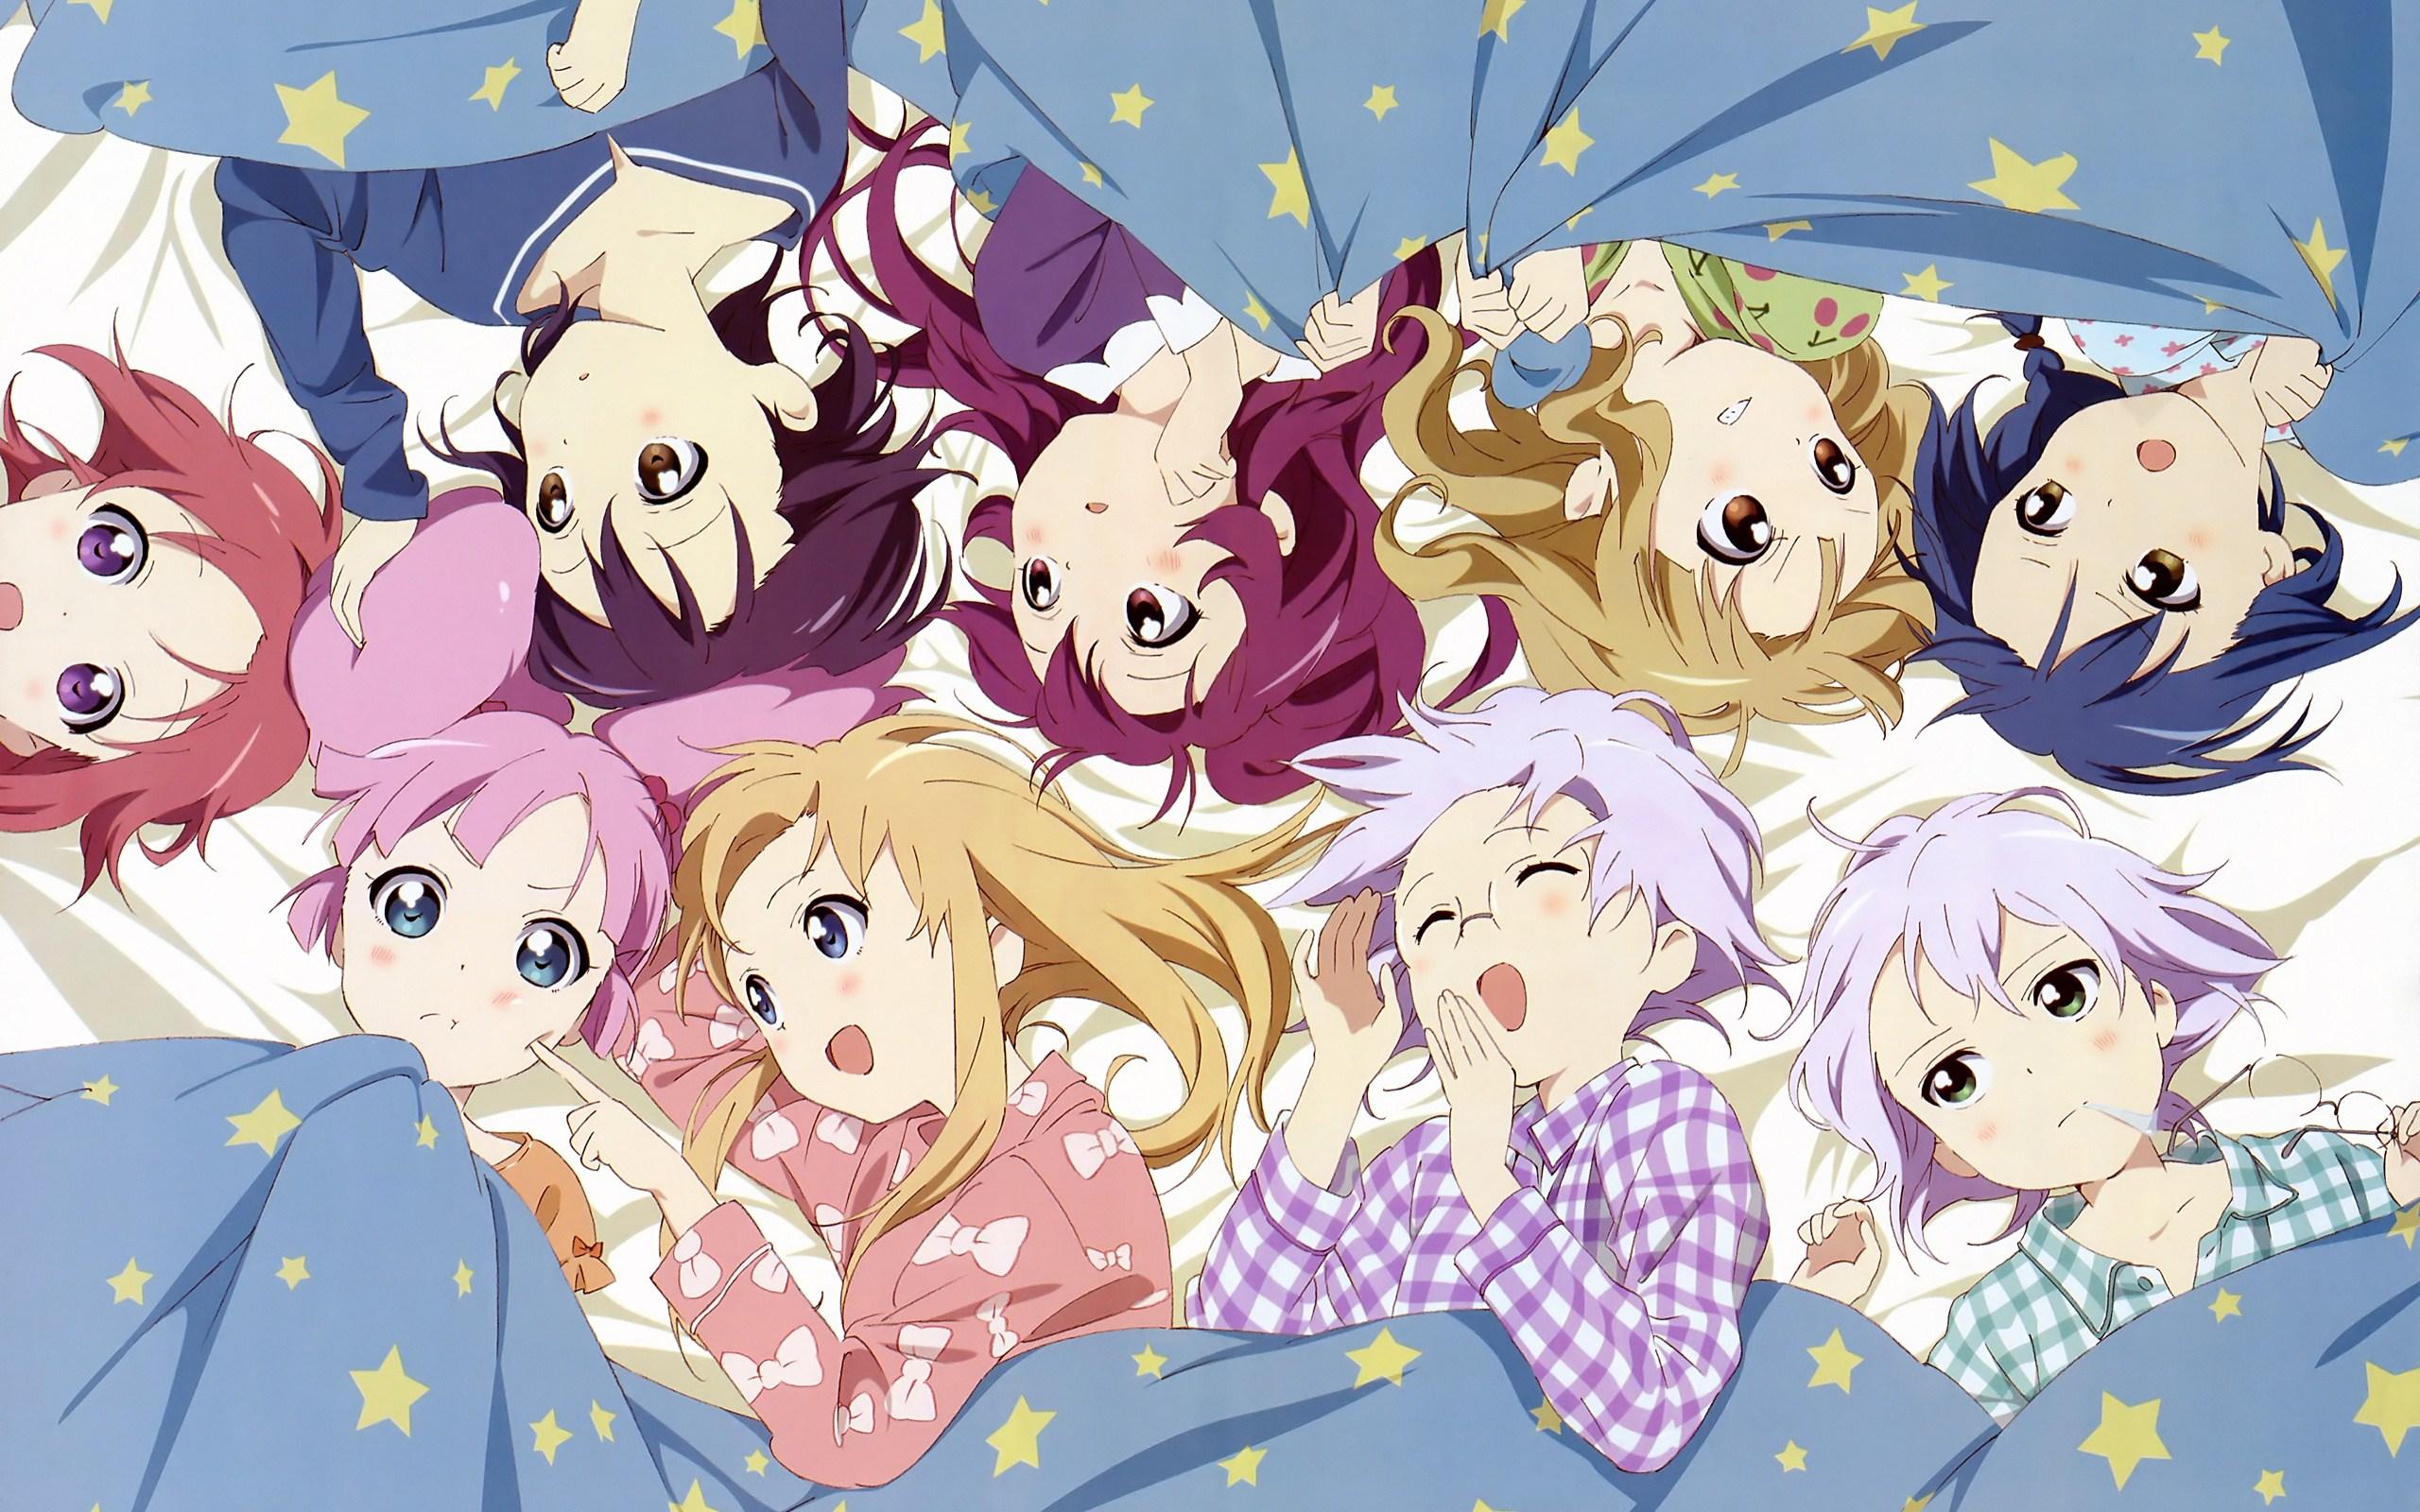 anime_wallpaper_Yuru-Yuri-19940612.jpeg